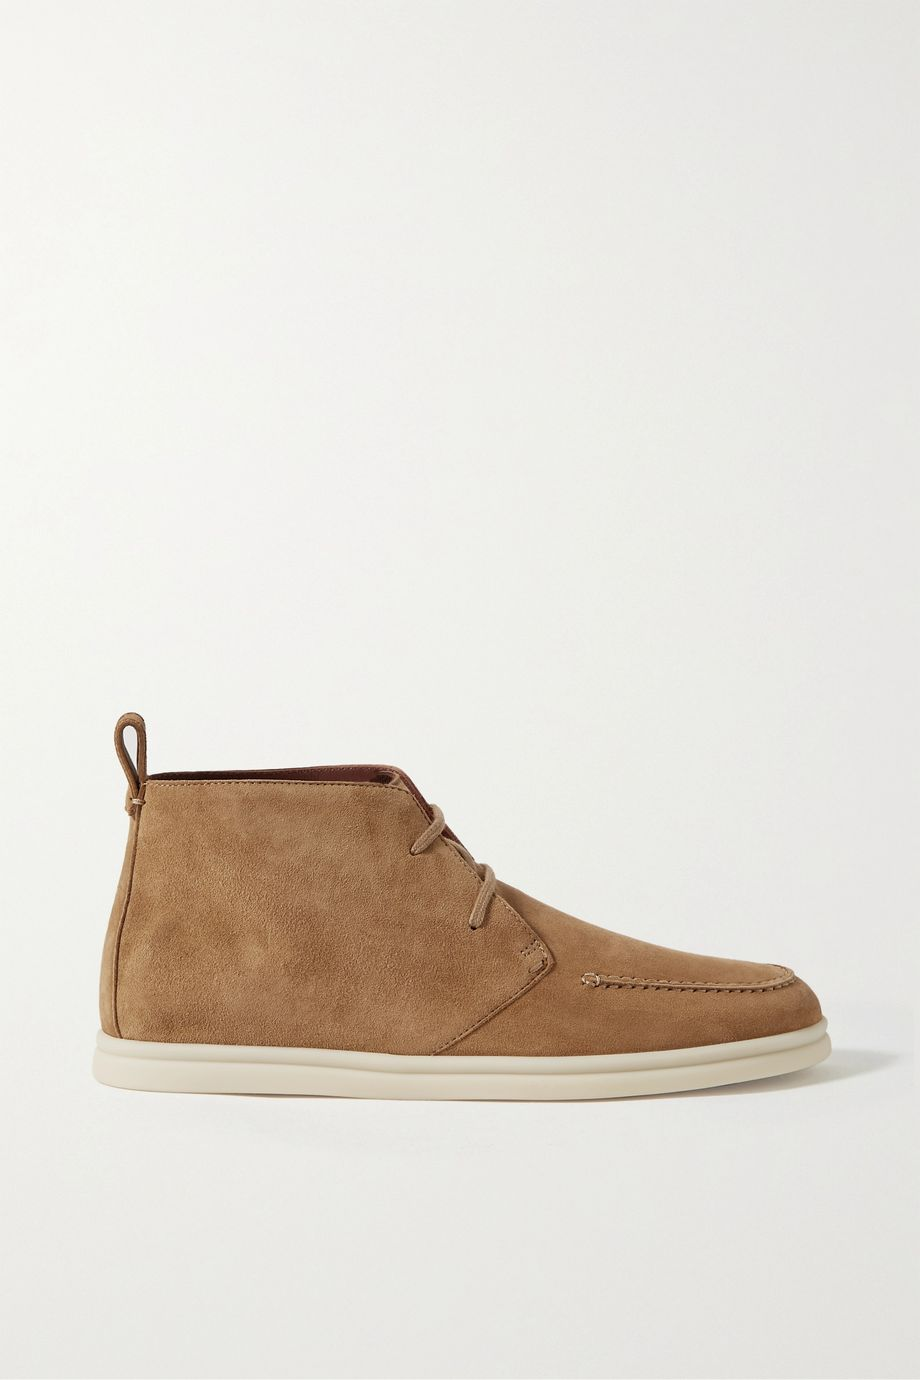 Loro Piana Namib Walk suede ankle boots